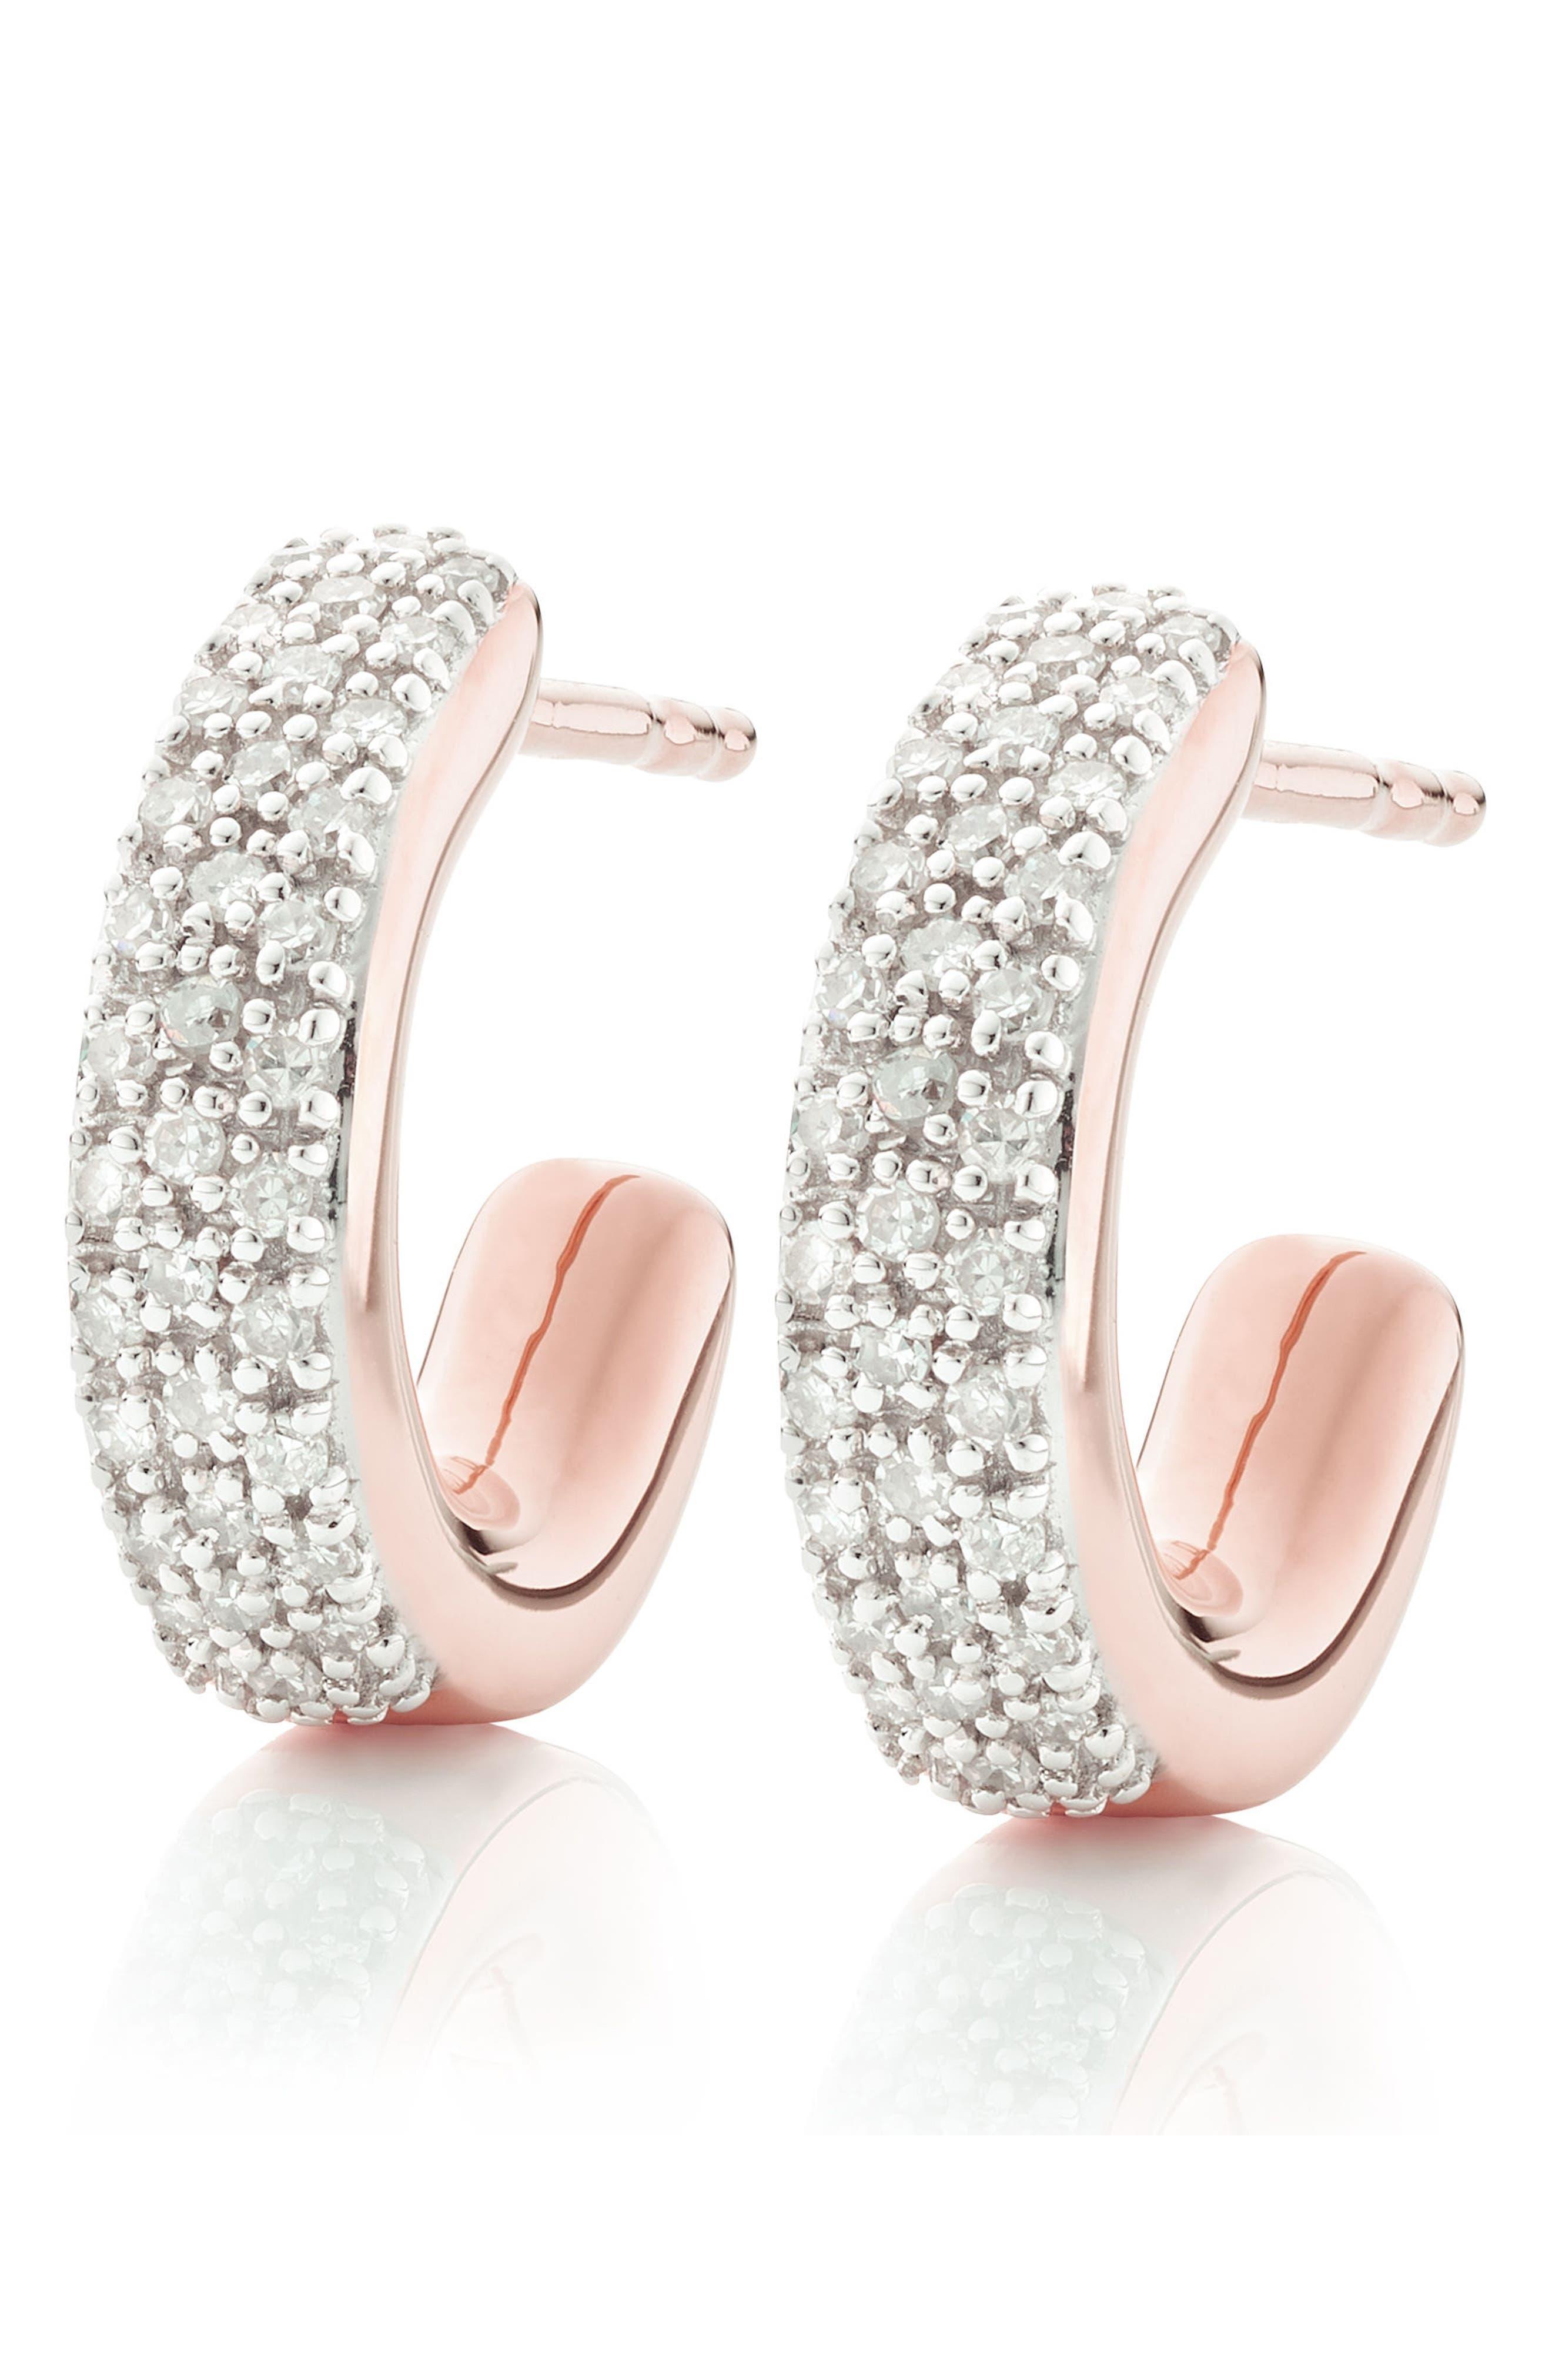 Fiji Mini Diamond Hoop Earrings,                             Alternate thumbnail 4, color,                             ROSE GOLD